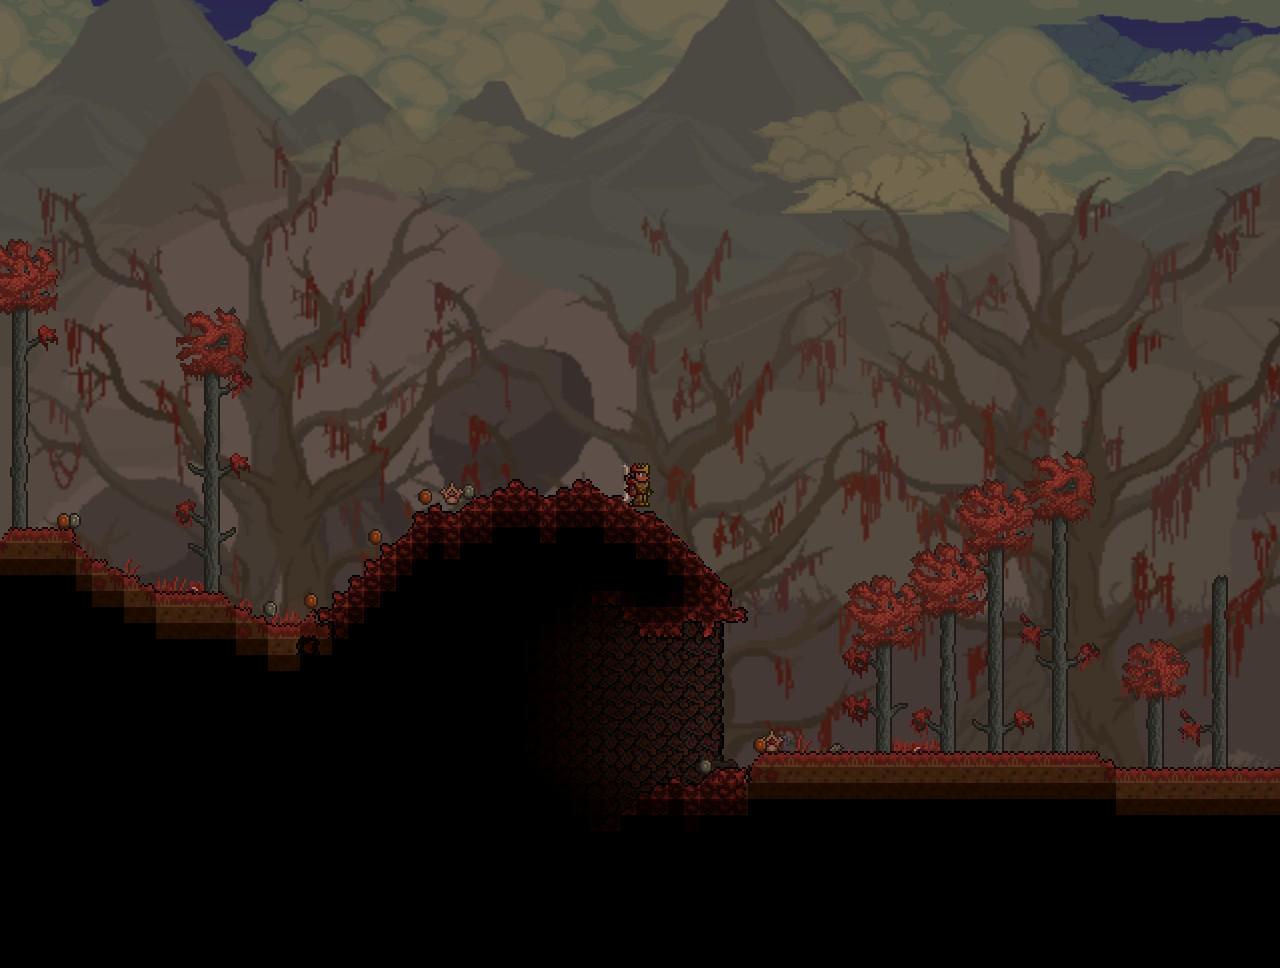 Terraria: The Crimson